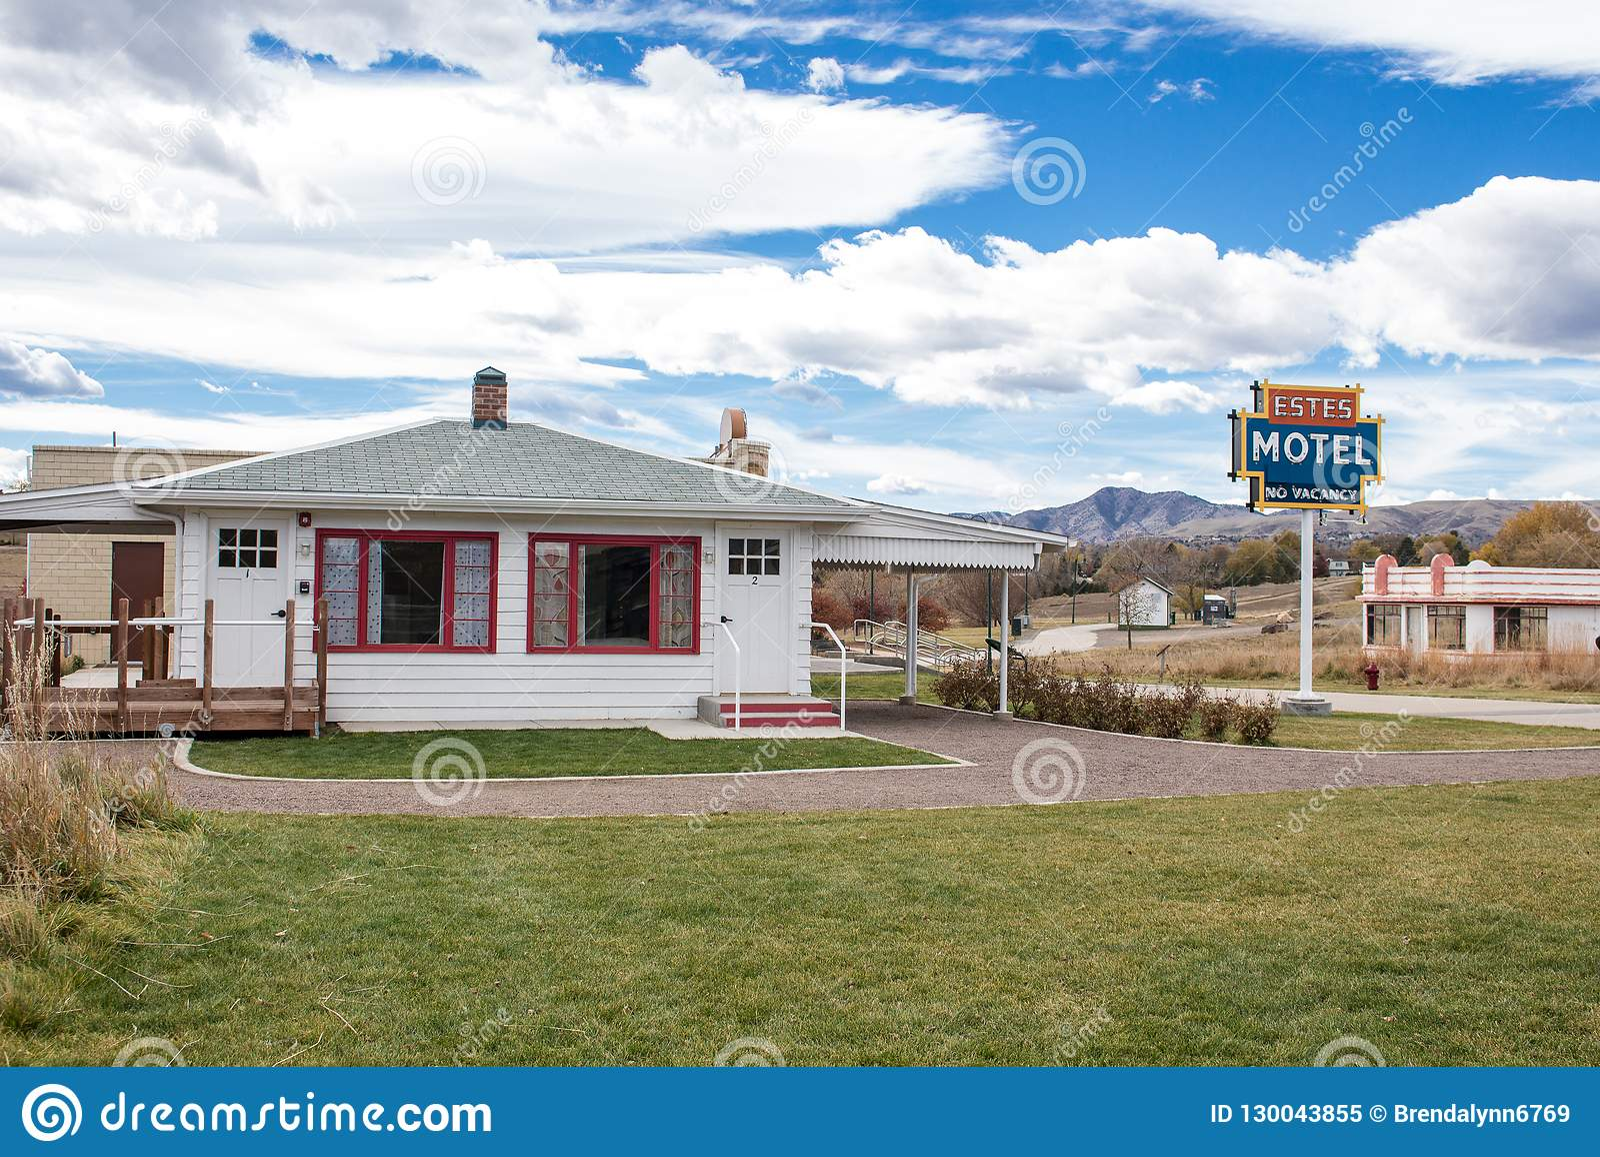 Estes Motel Lakewood Colorado Editorial Image Image Of Mountains Building 130043855